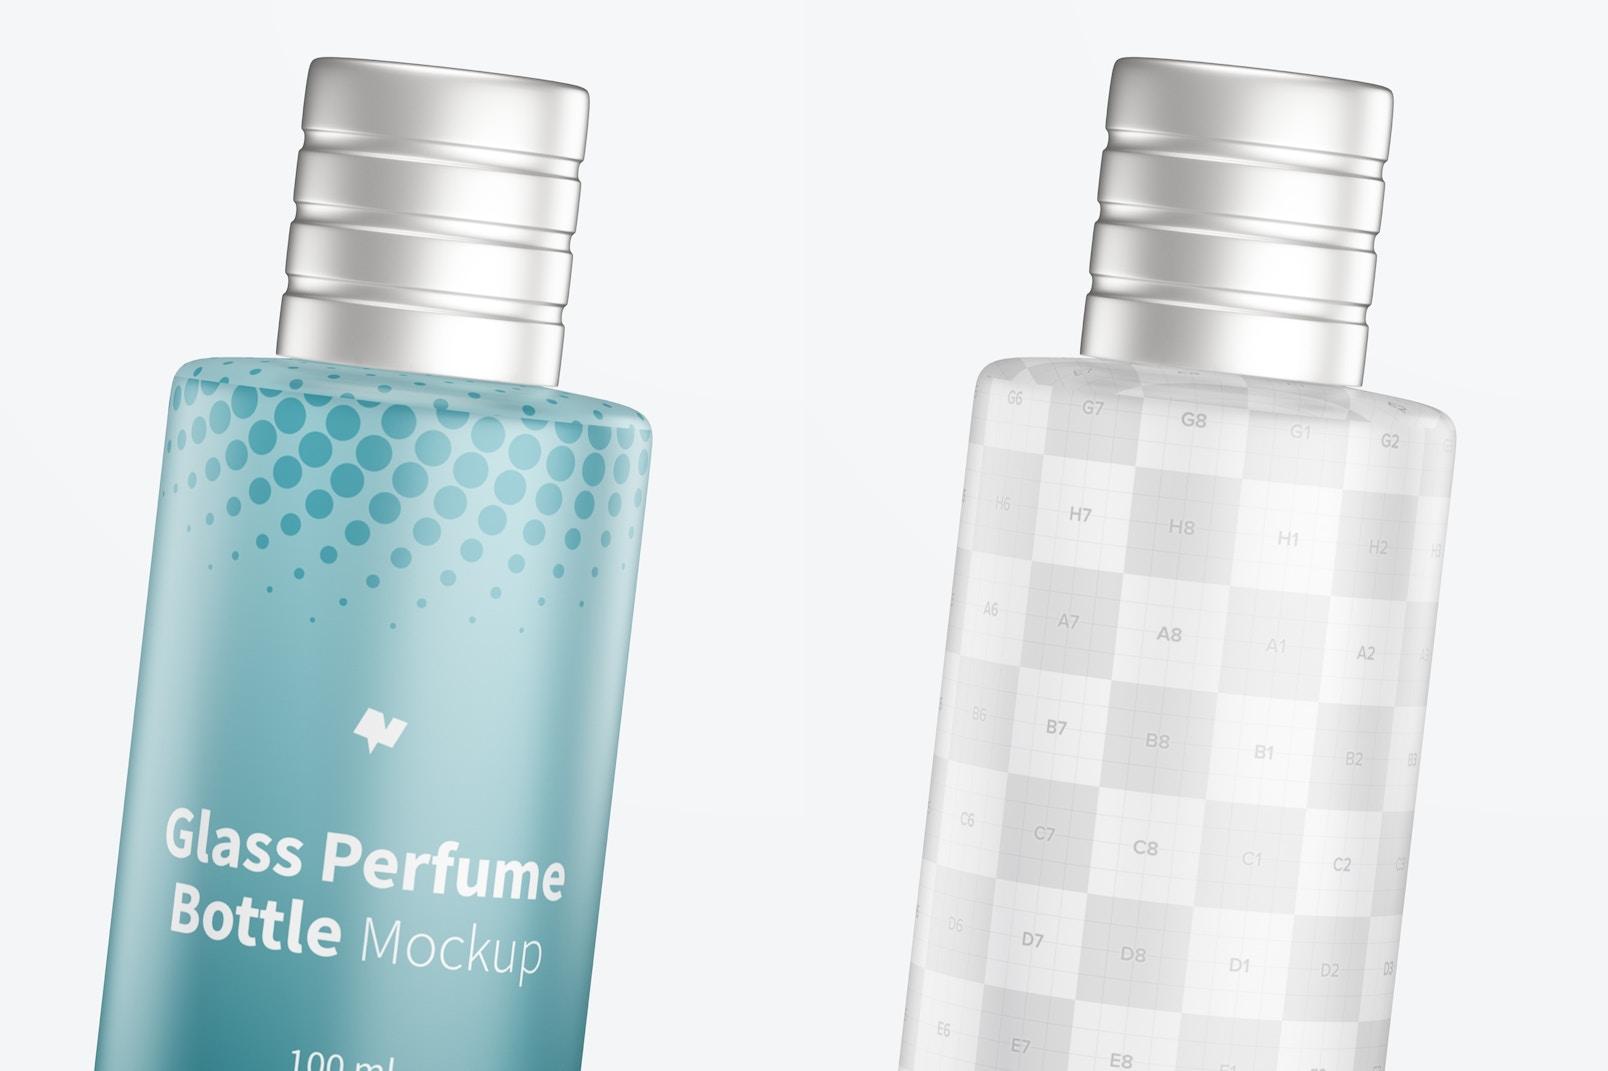 100 ml Glass Perfume Bottle Mockup, Close Up